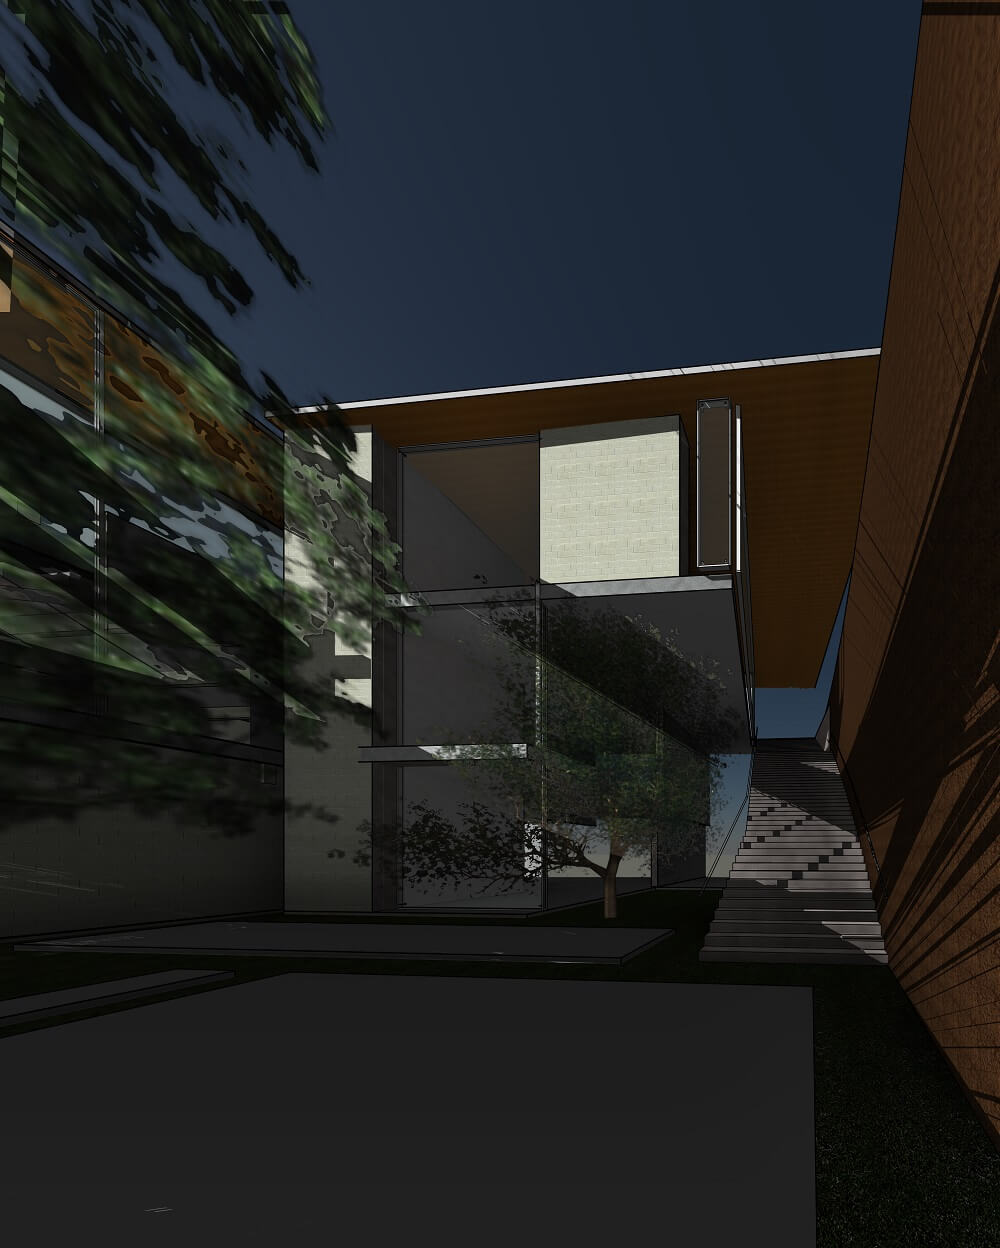 RZ-3D-new-3D-View-מבט-אל-מדרגות-רחבת-רחבעם